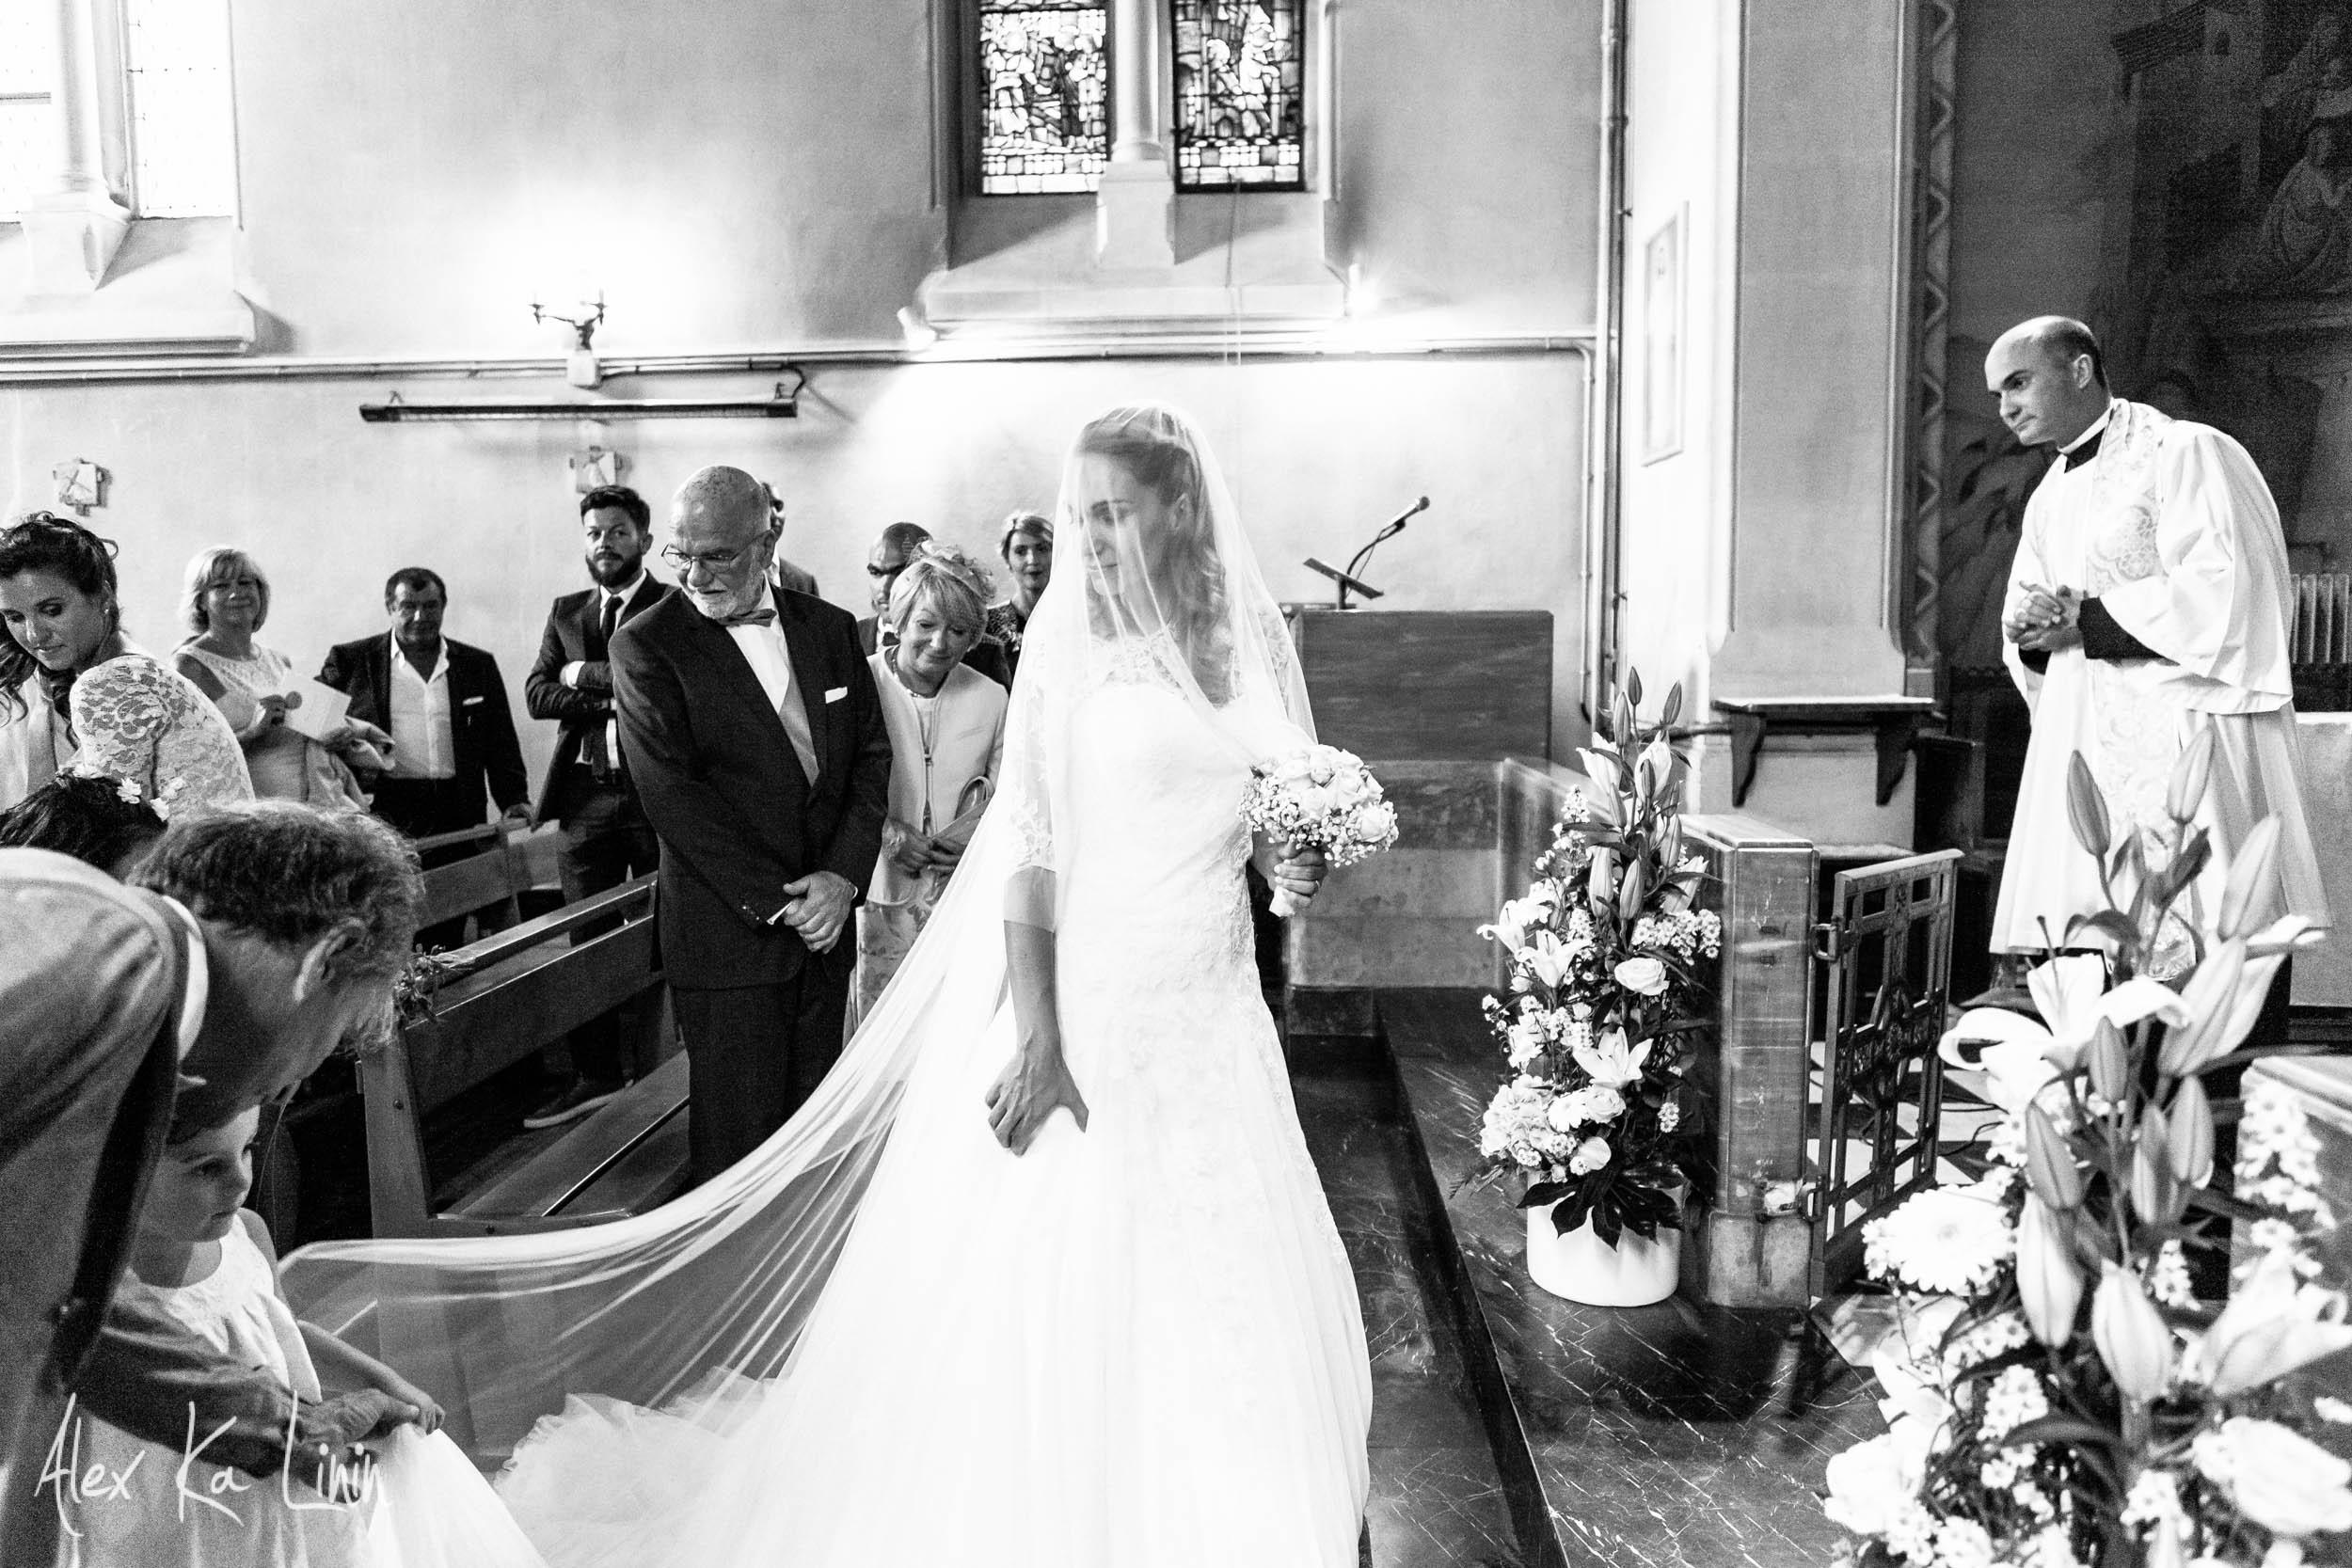 AlexKa_wedding_mariage_photographer-24.jpg